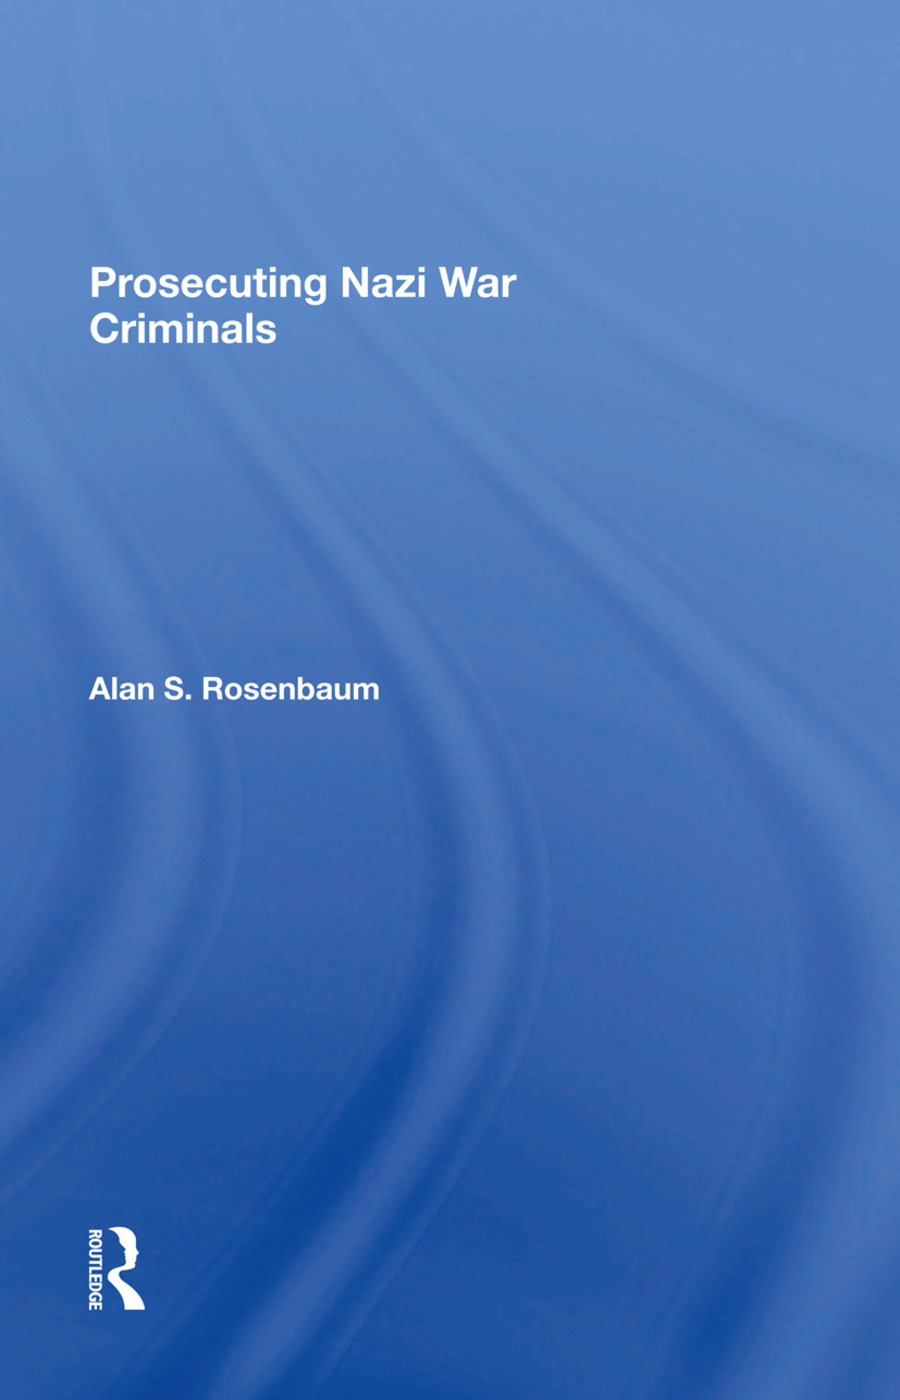 Prosecuting Nazi War Criminals book cover